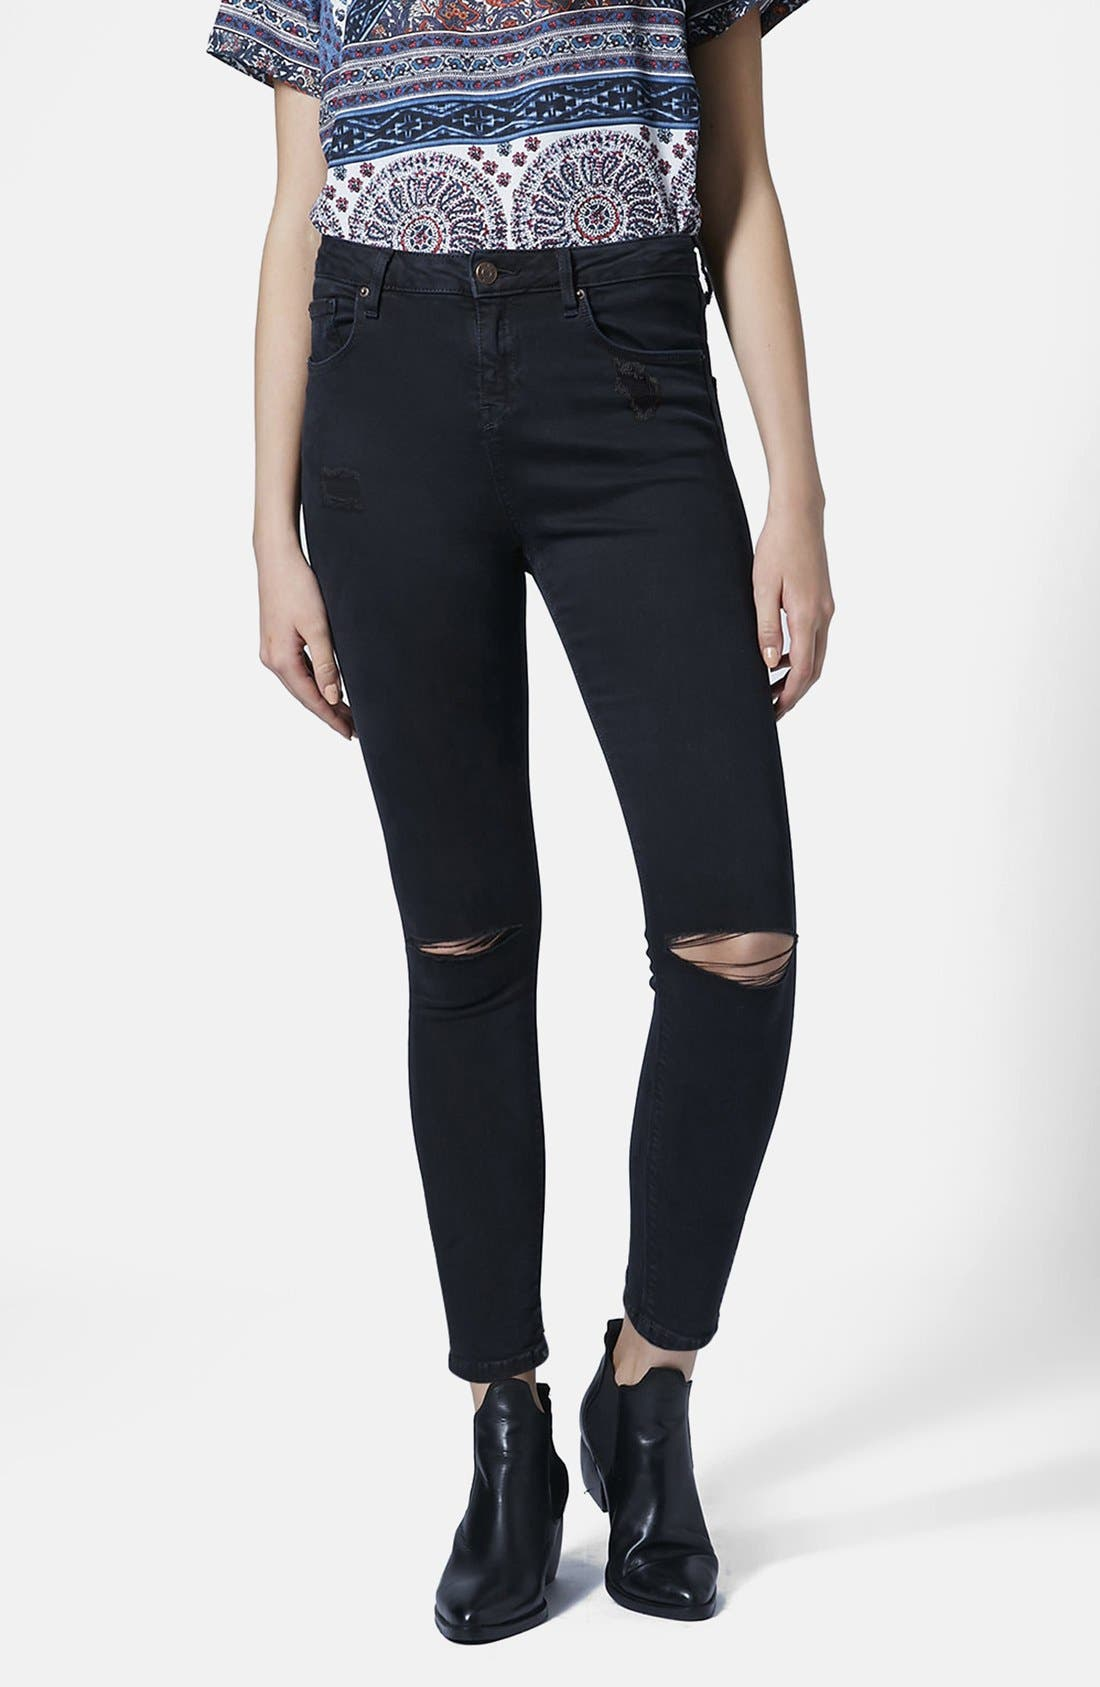 Main Image - Topshop 'Jamie' Ripped Skinny Jeans (Petite)